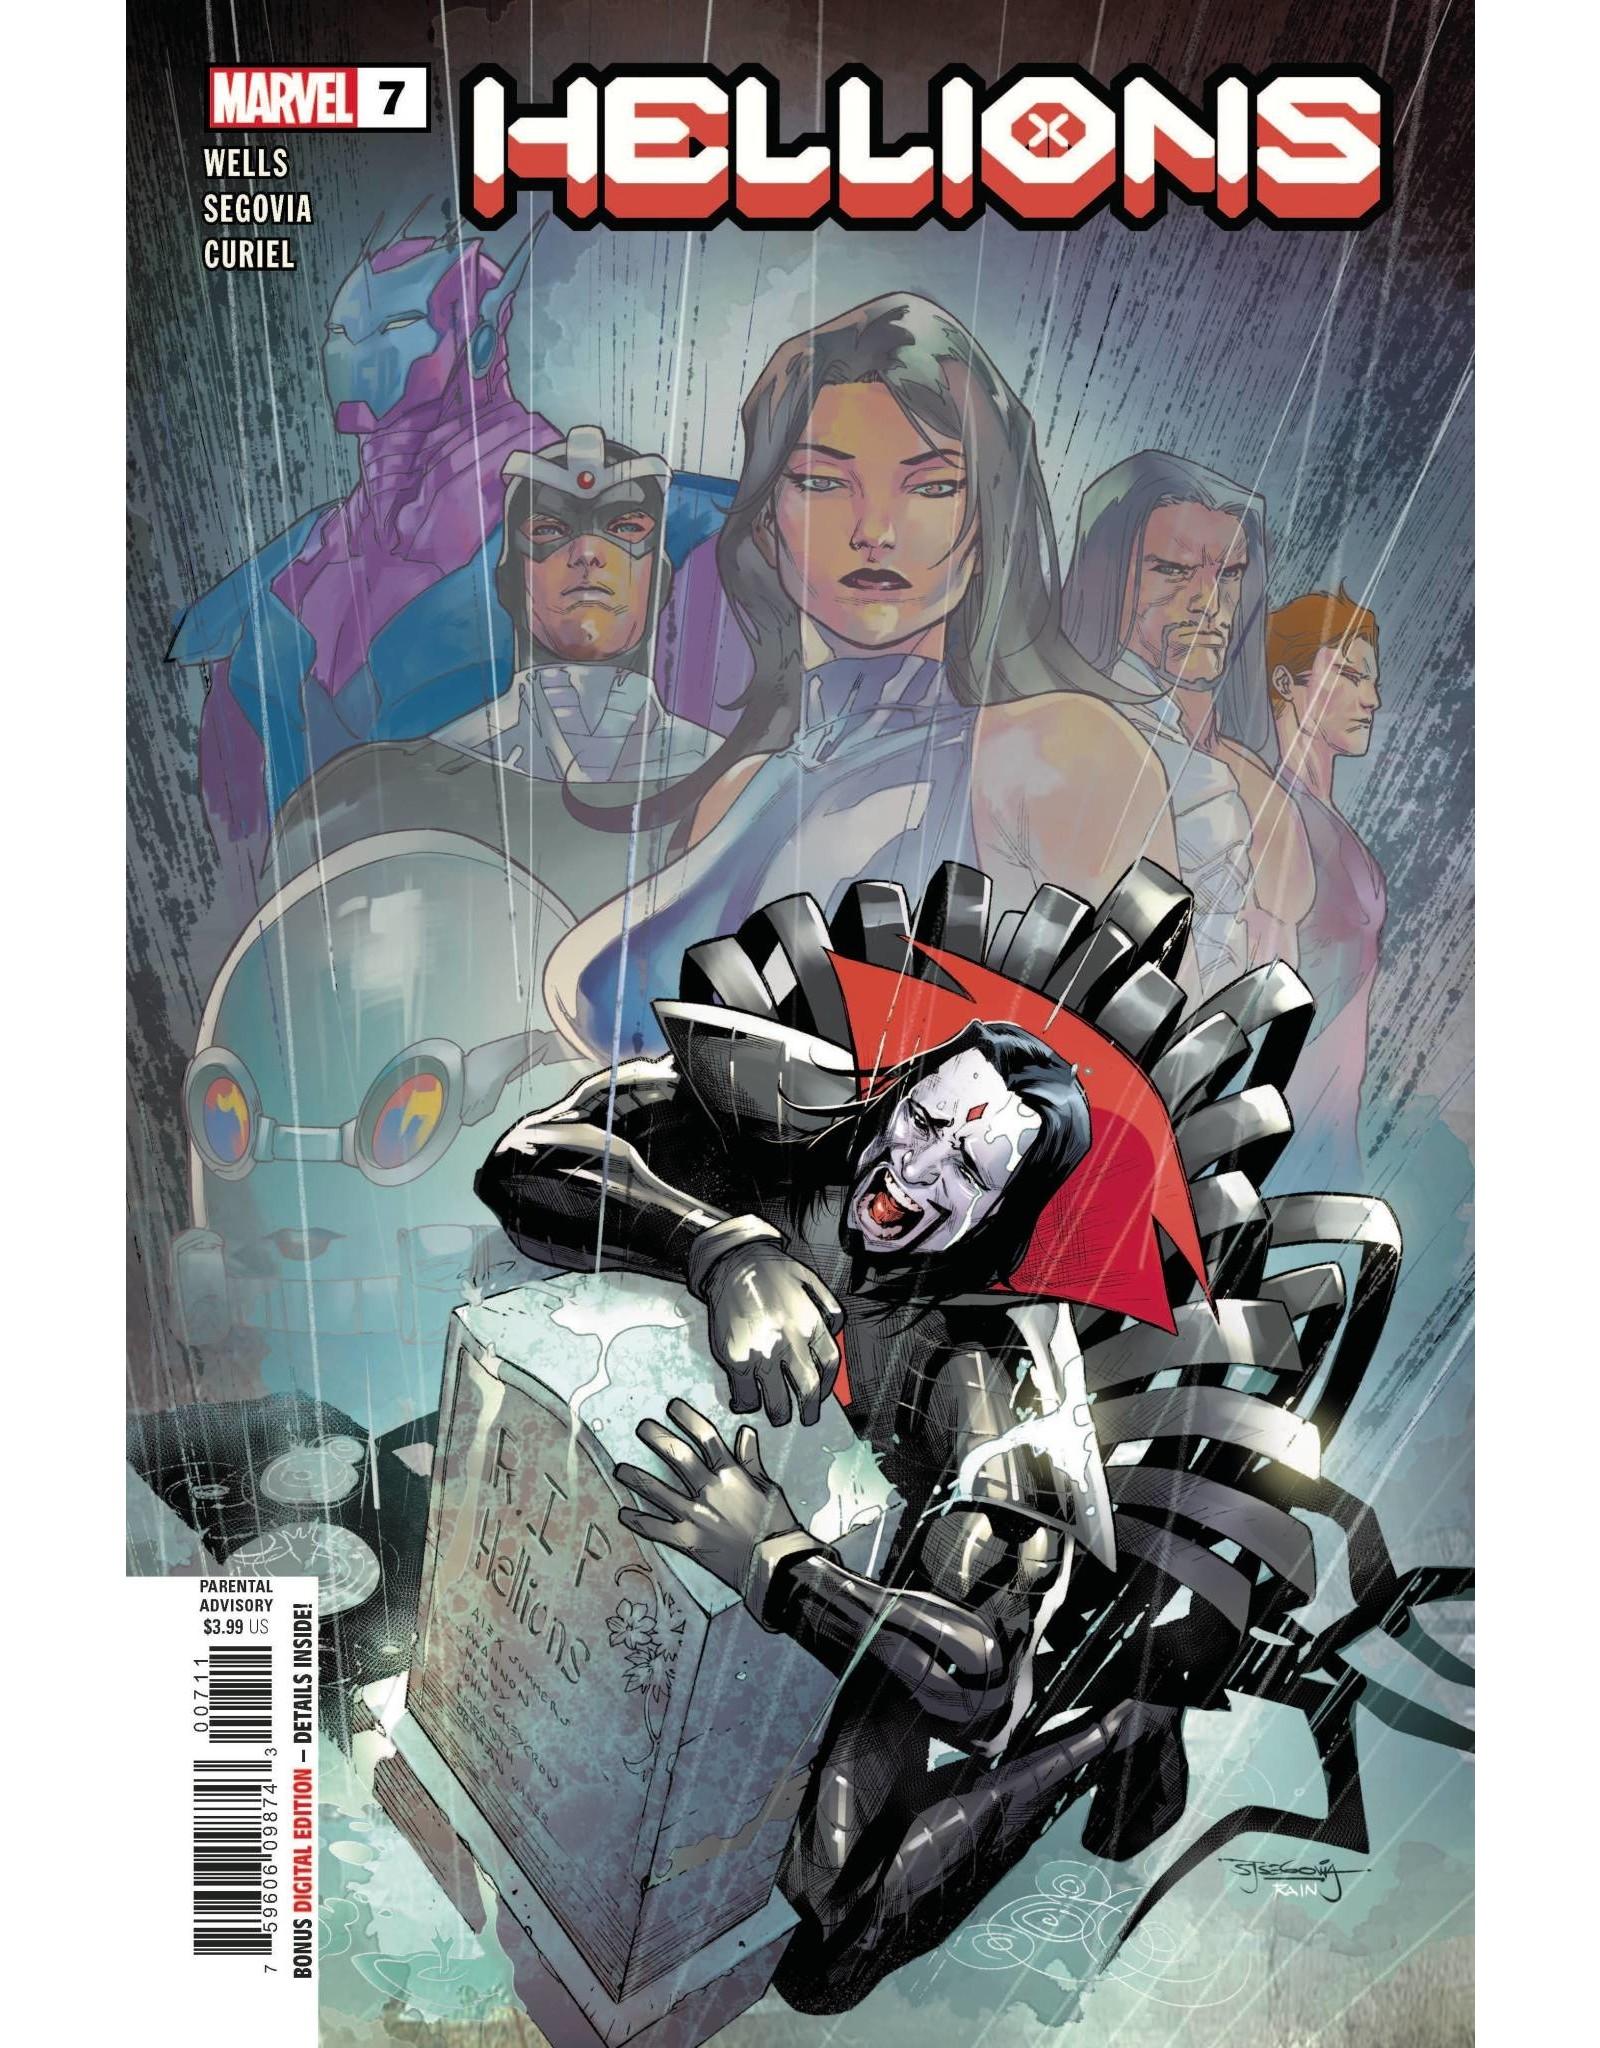 Marvel Comics HELLIONS #7 XOS